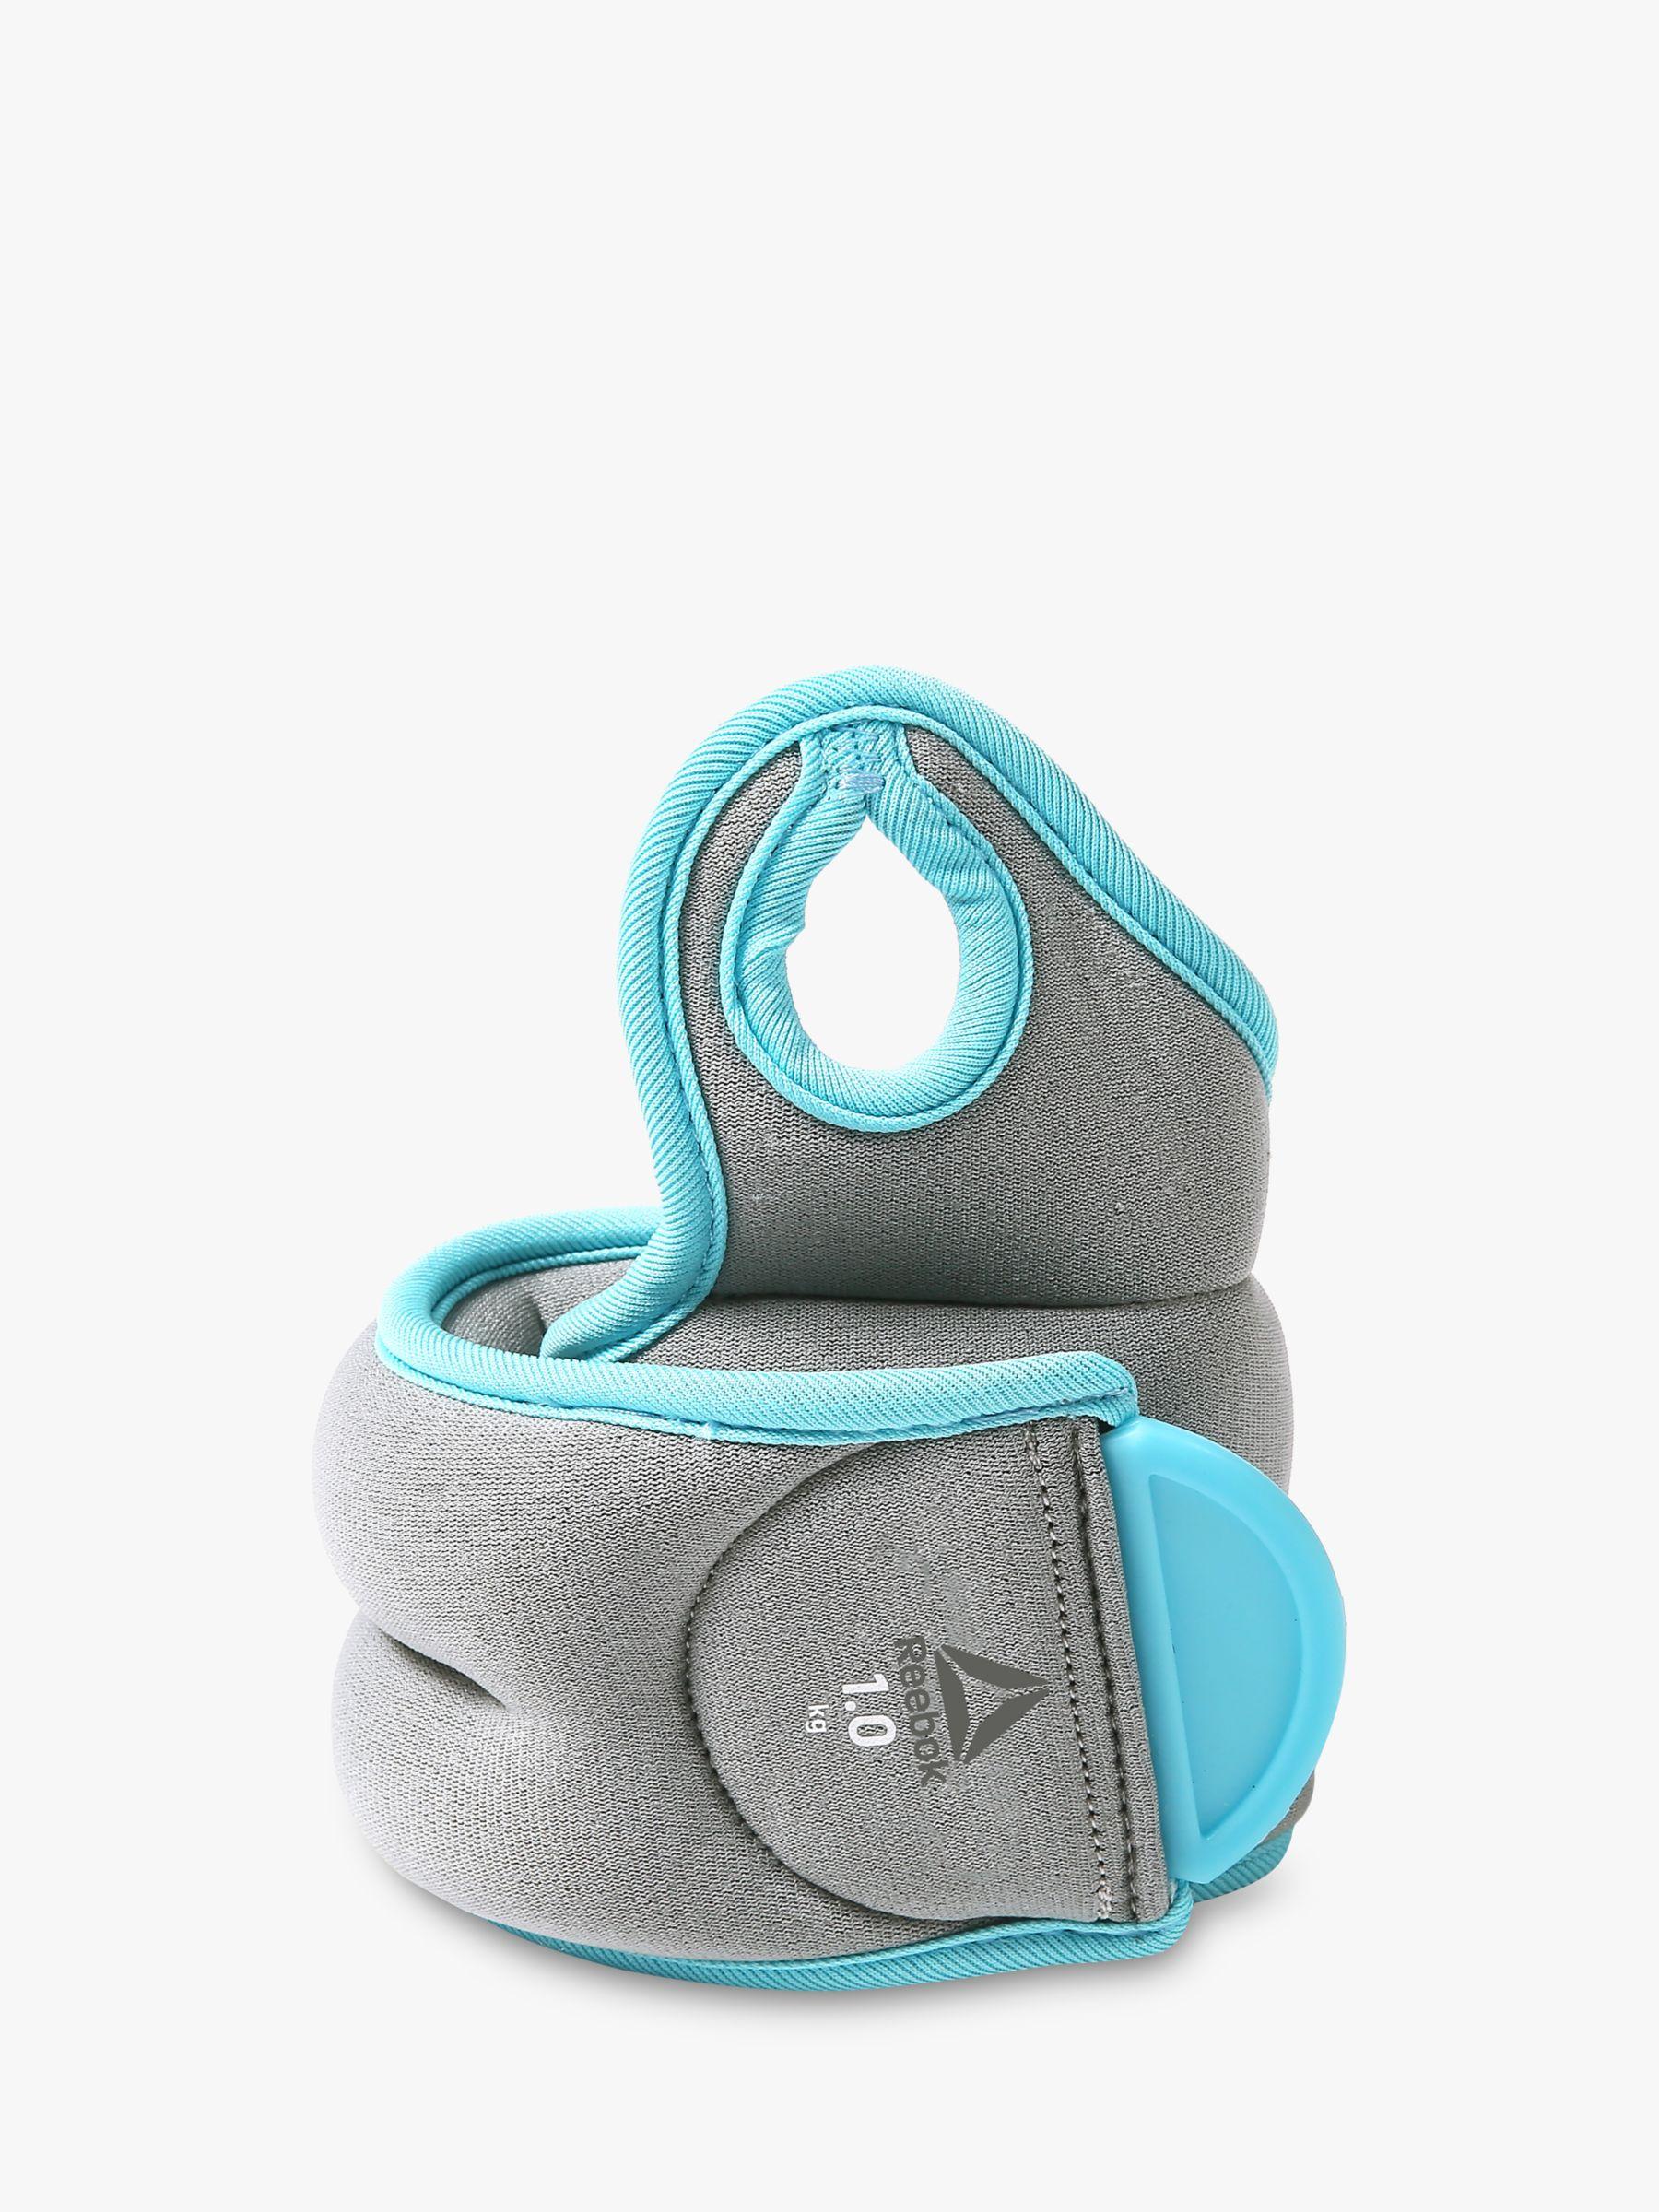 Reebok Reebok Training 2x1kg Wrist Weights, Grey/Blue